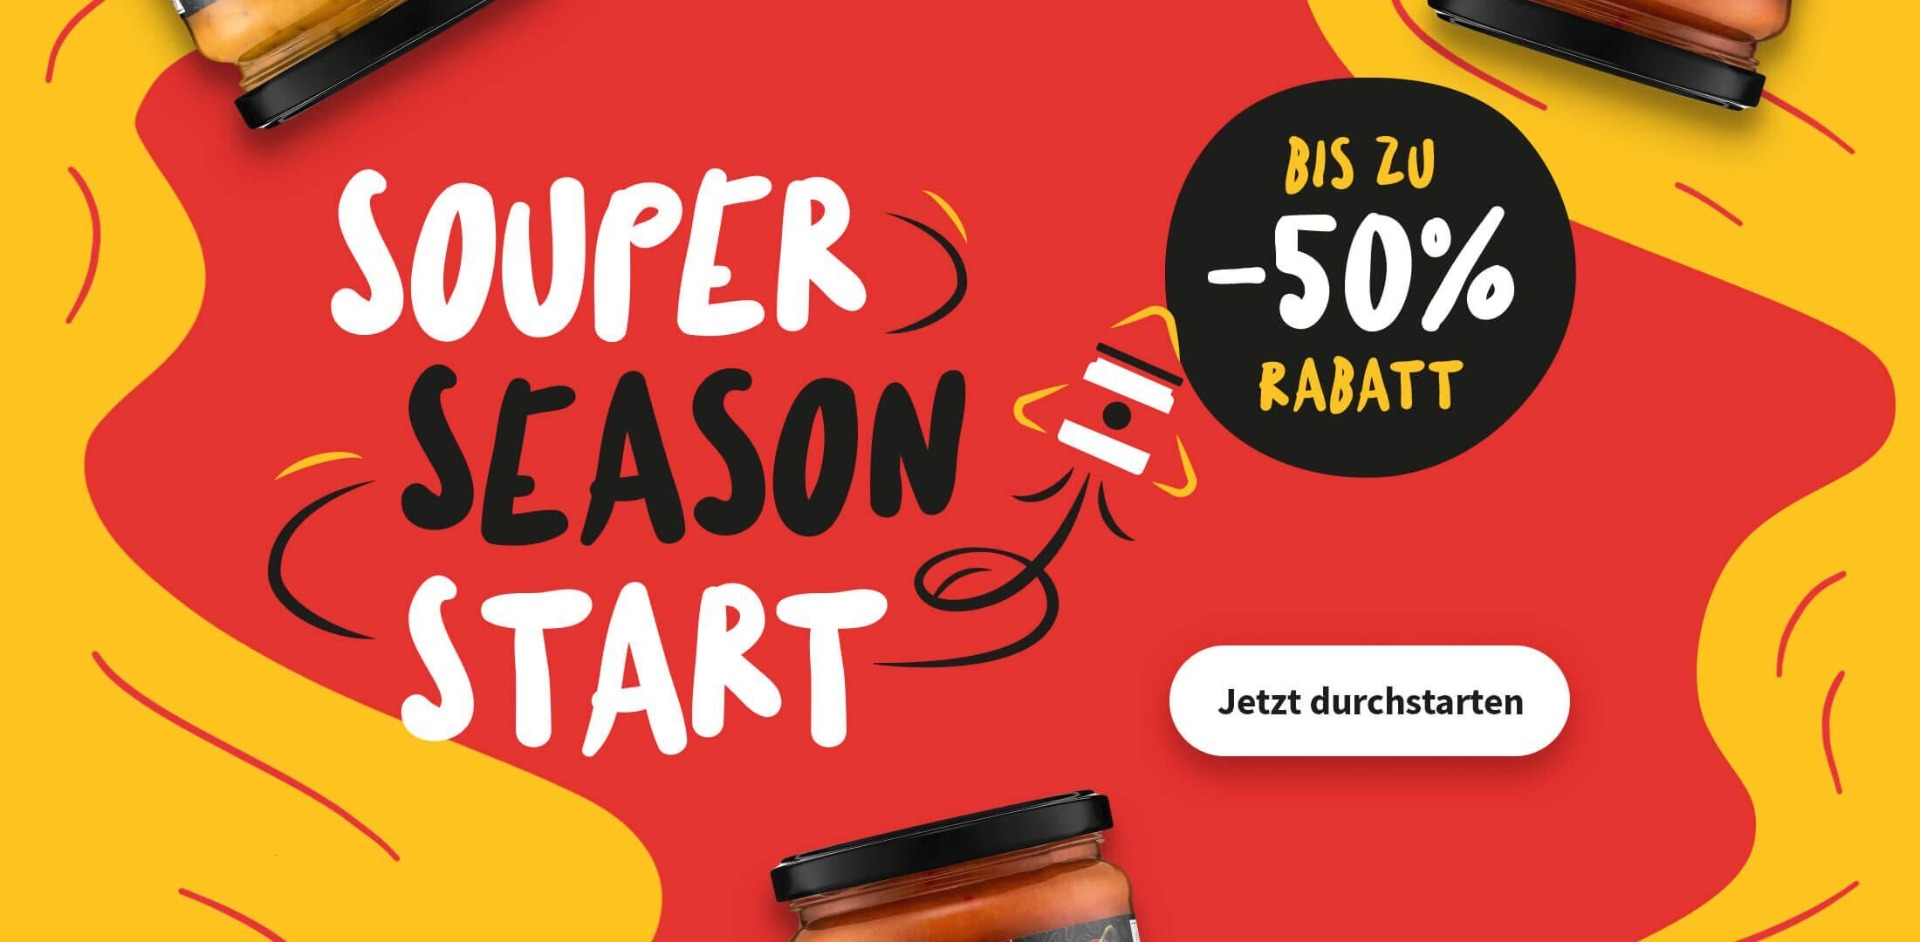 Souper Season Start